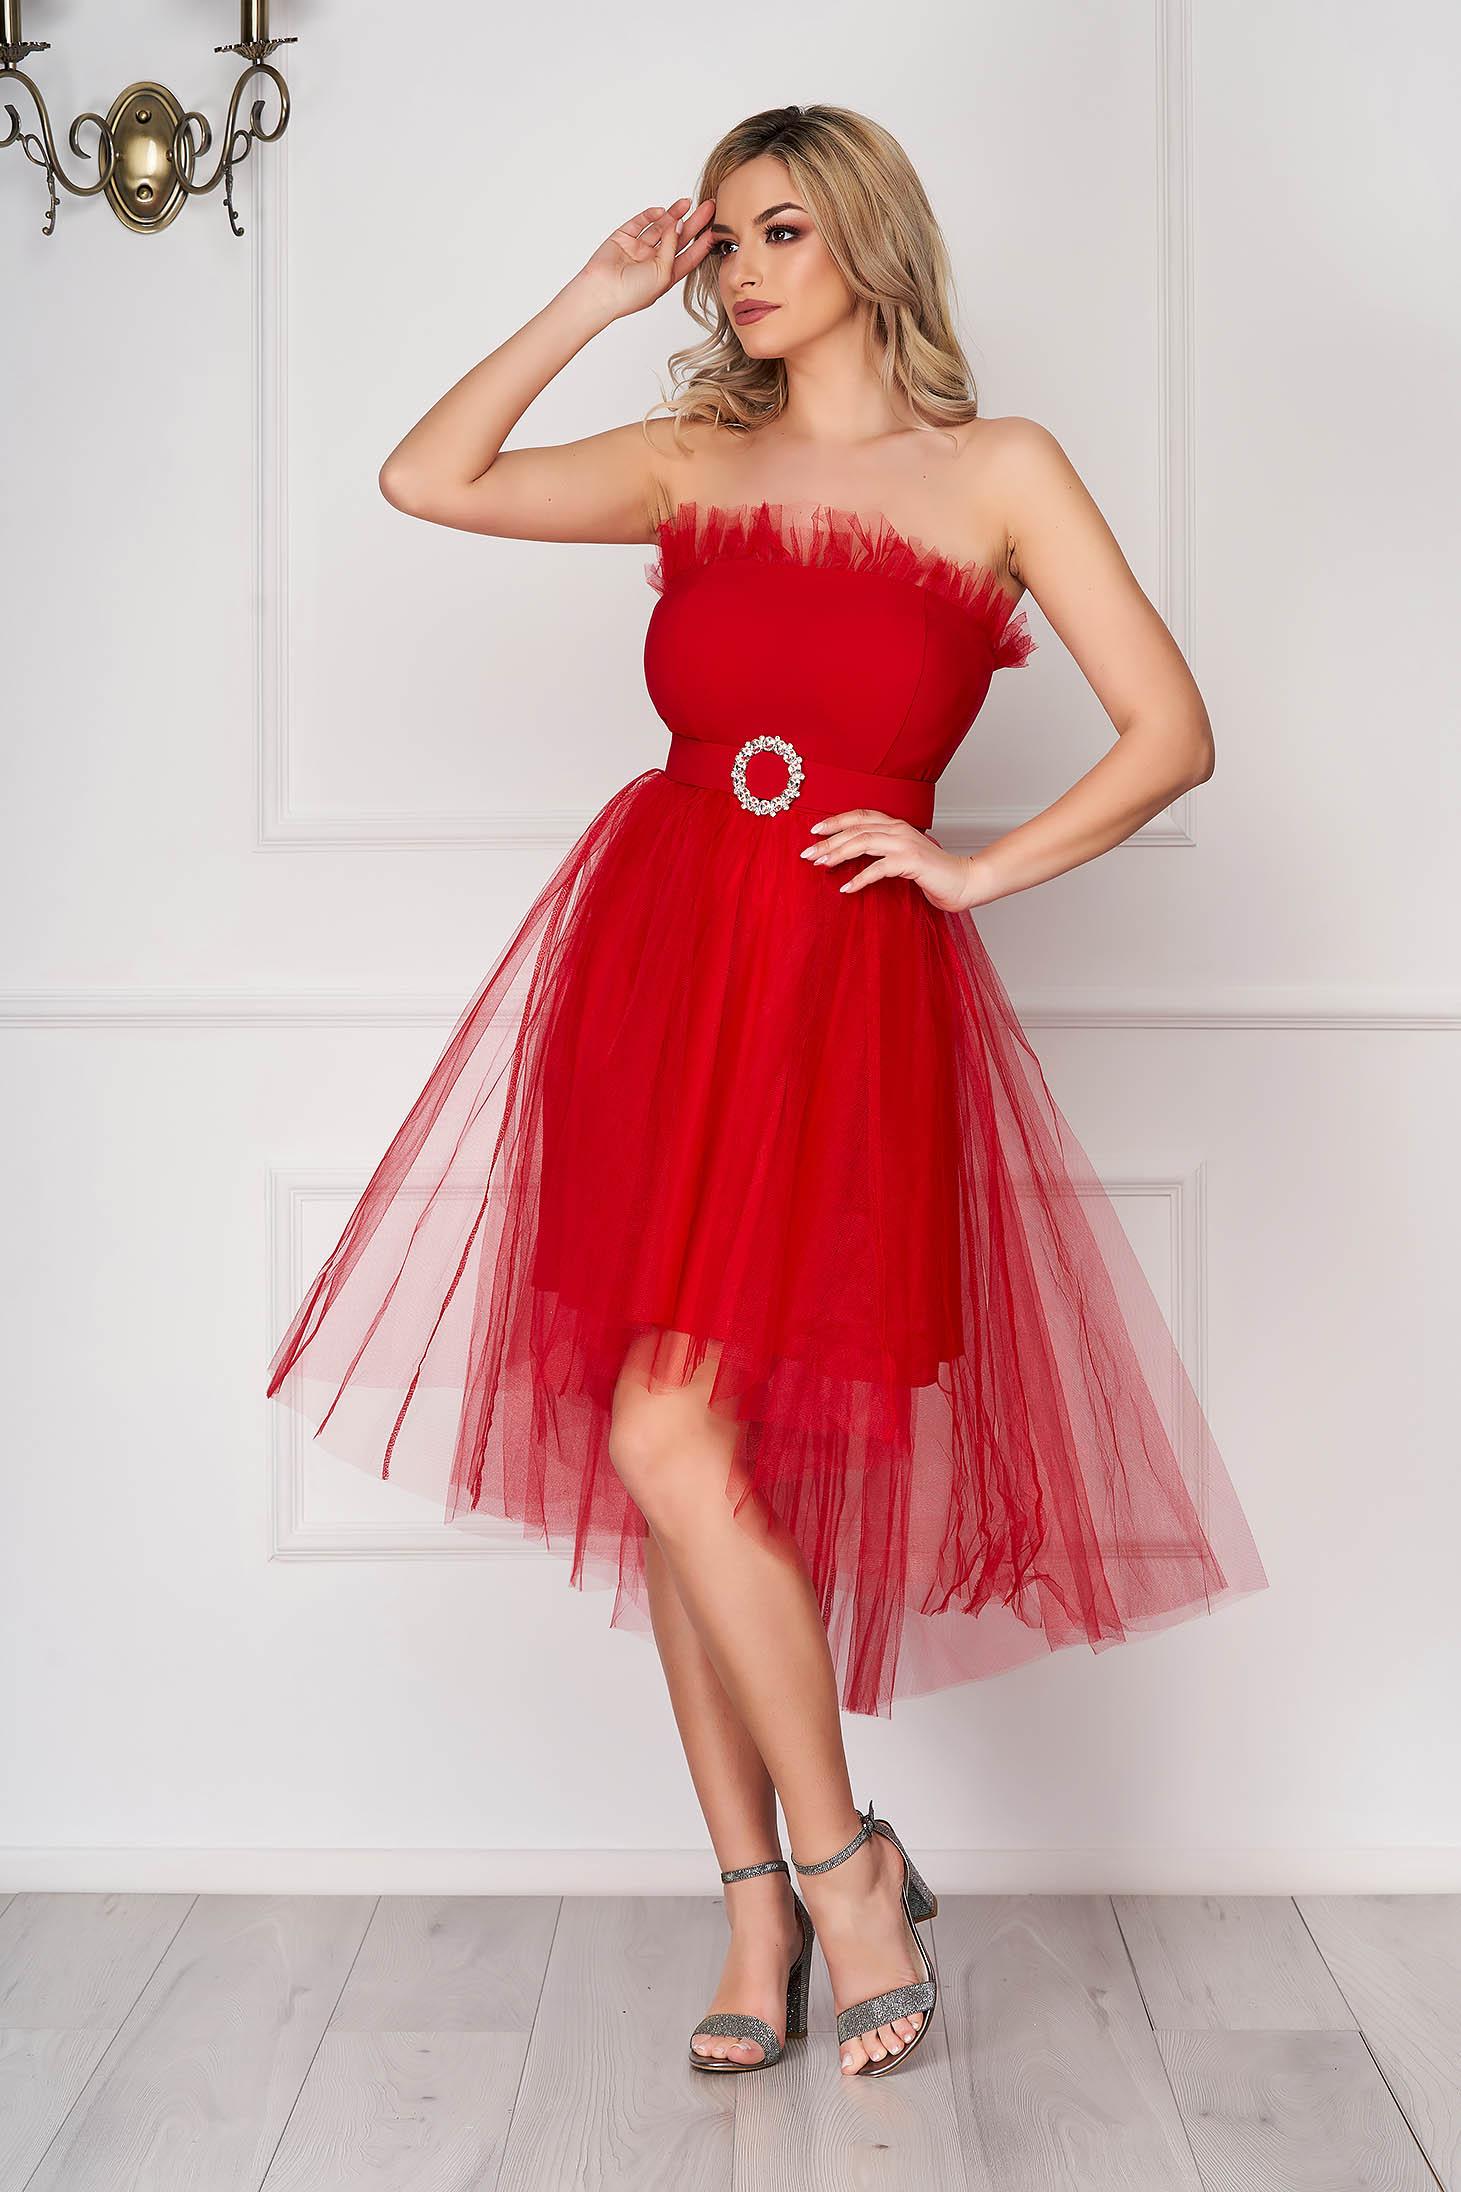 Rochie rosie scurta de ocazie asimetrica in clos din tul fara bretele